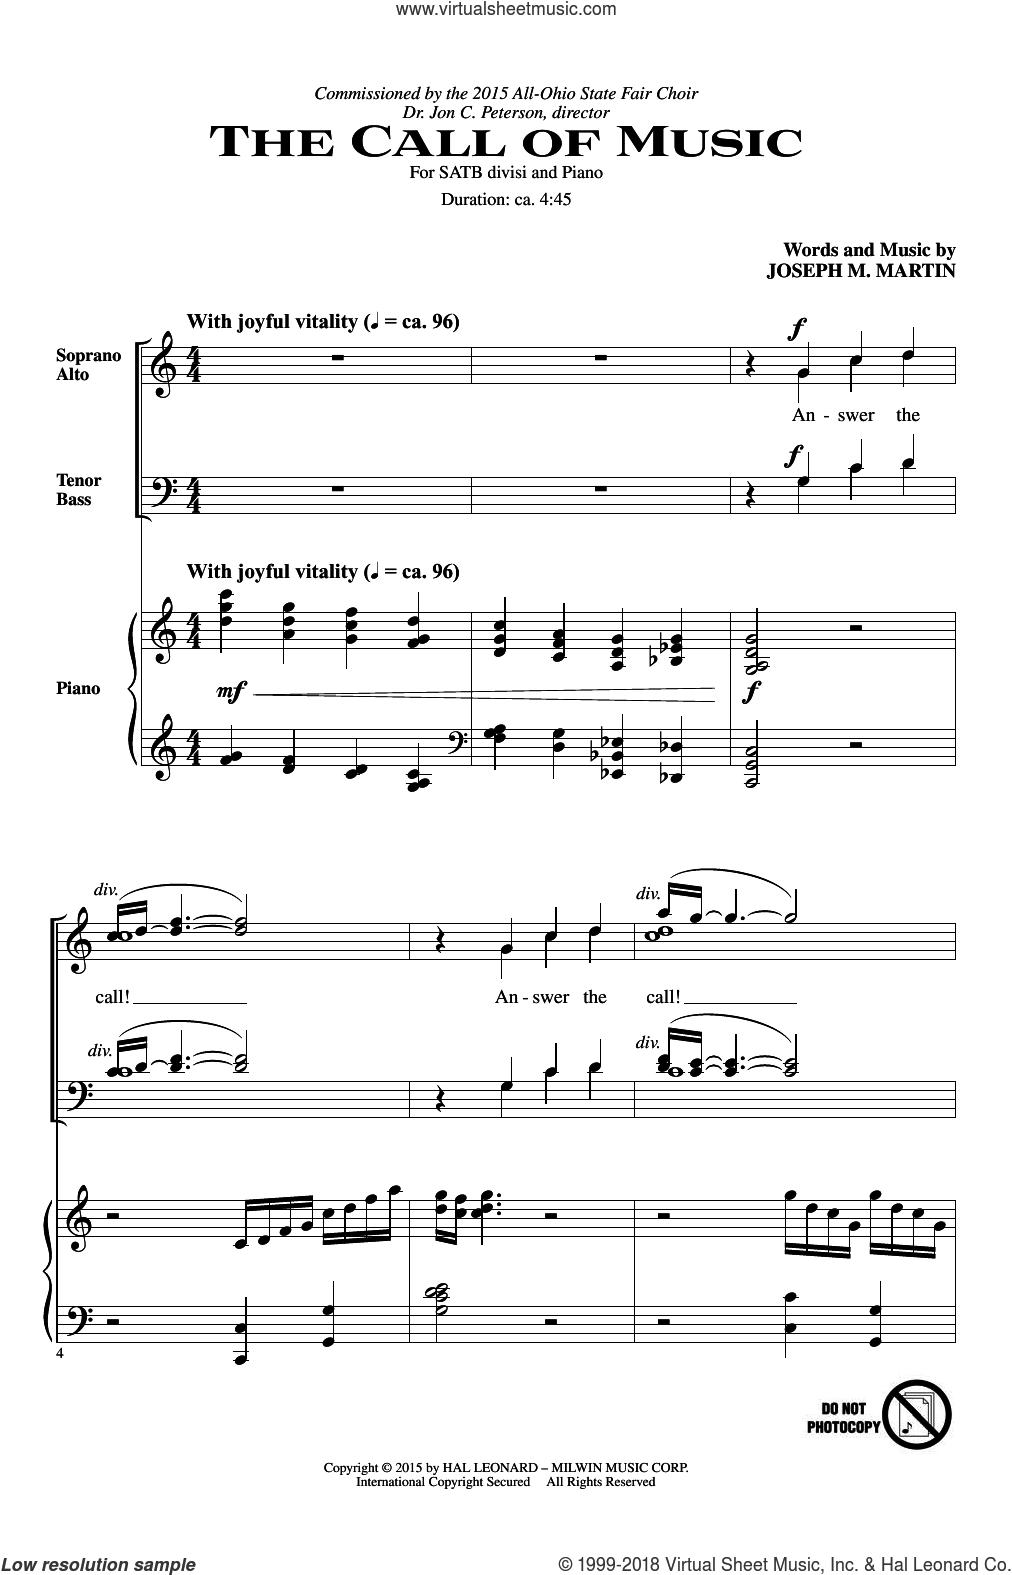 The Call Of Music sheet music for choir (SATB: soprano, alto, tenor, bass) by Joseph M. Martin, intermediate skill level